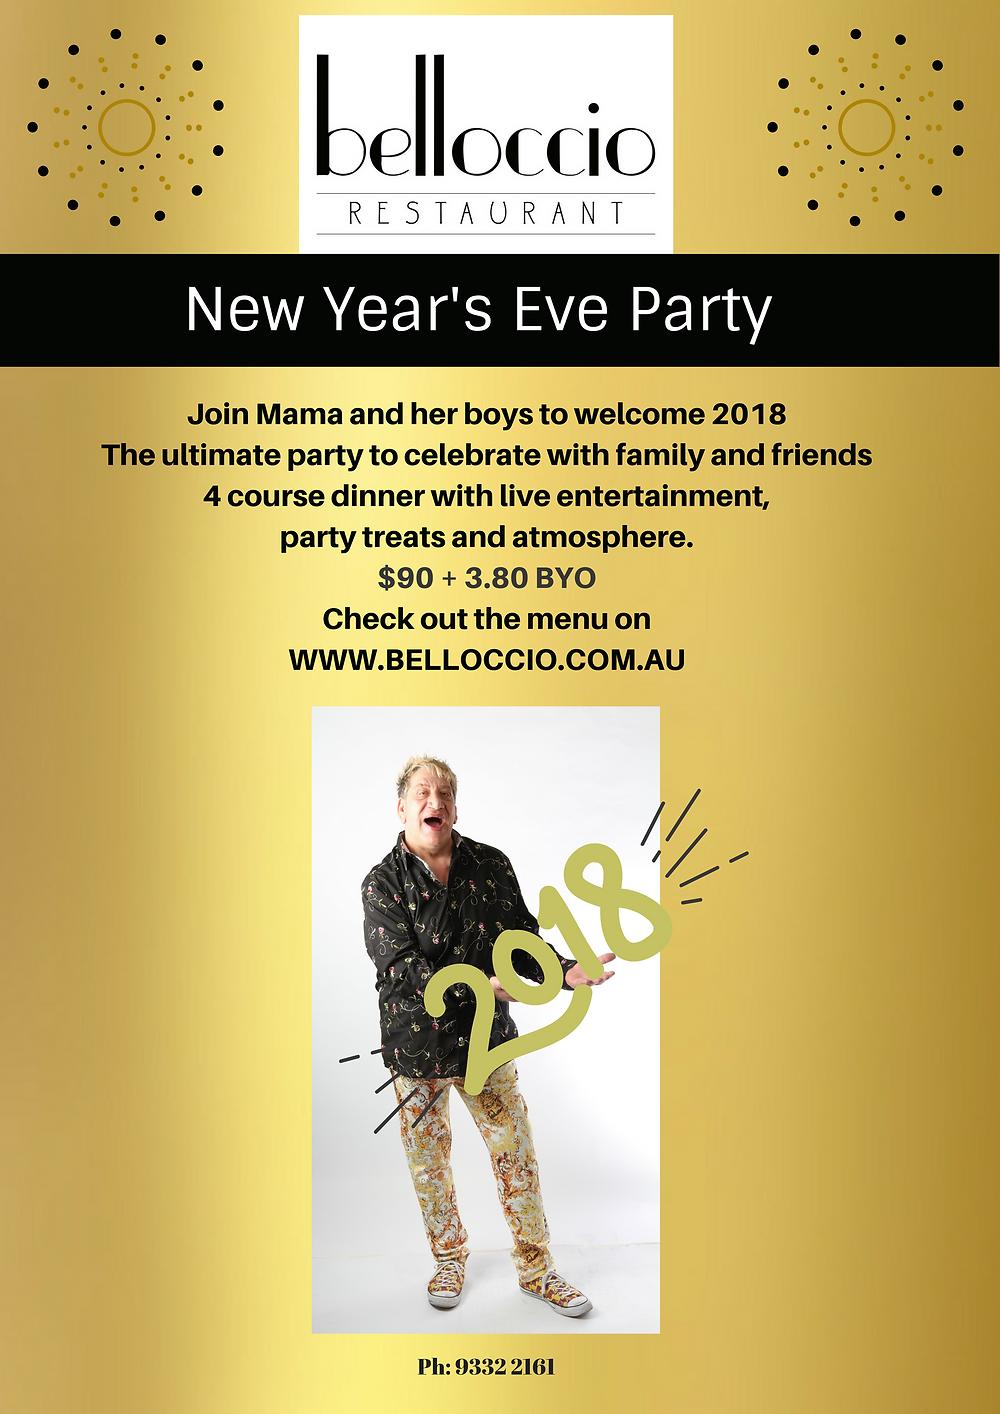 New Year's Eve at Belloccio